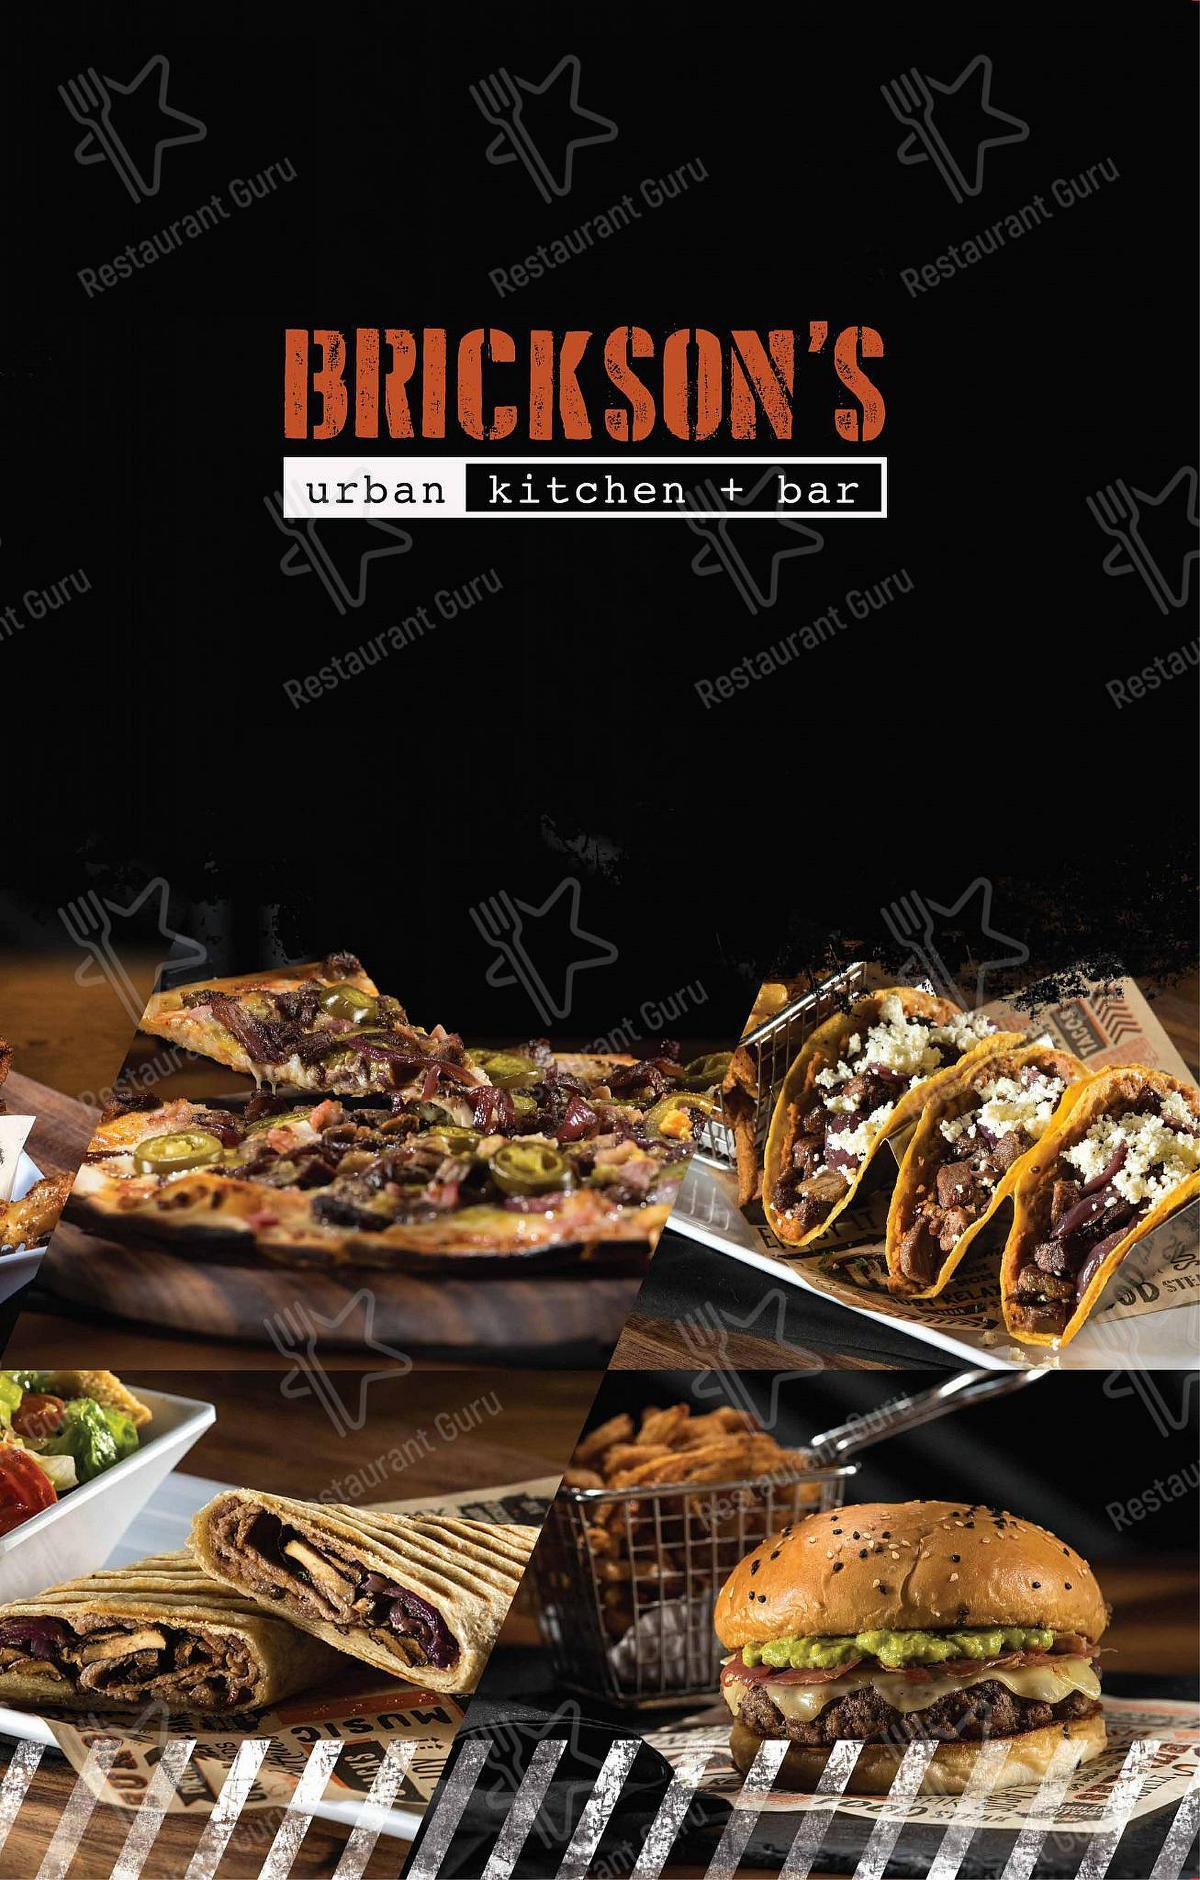 Carta de Brickson's Urban Kitchen + Bar restaurante